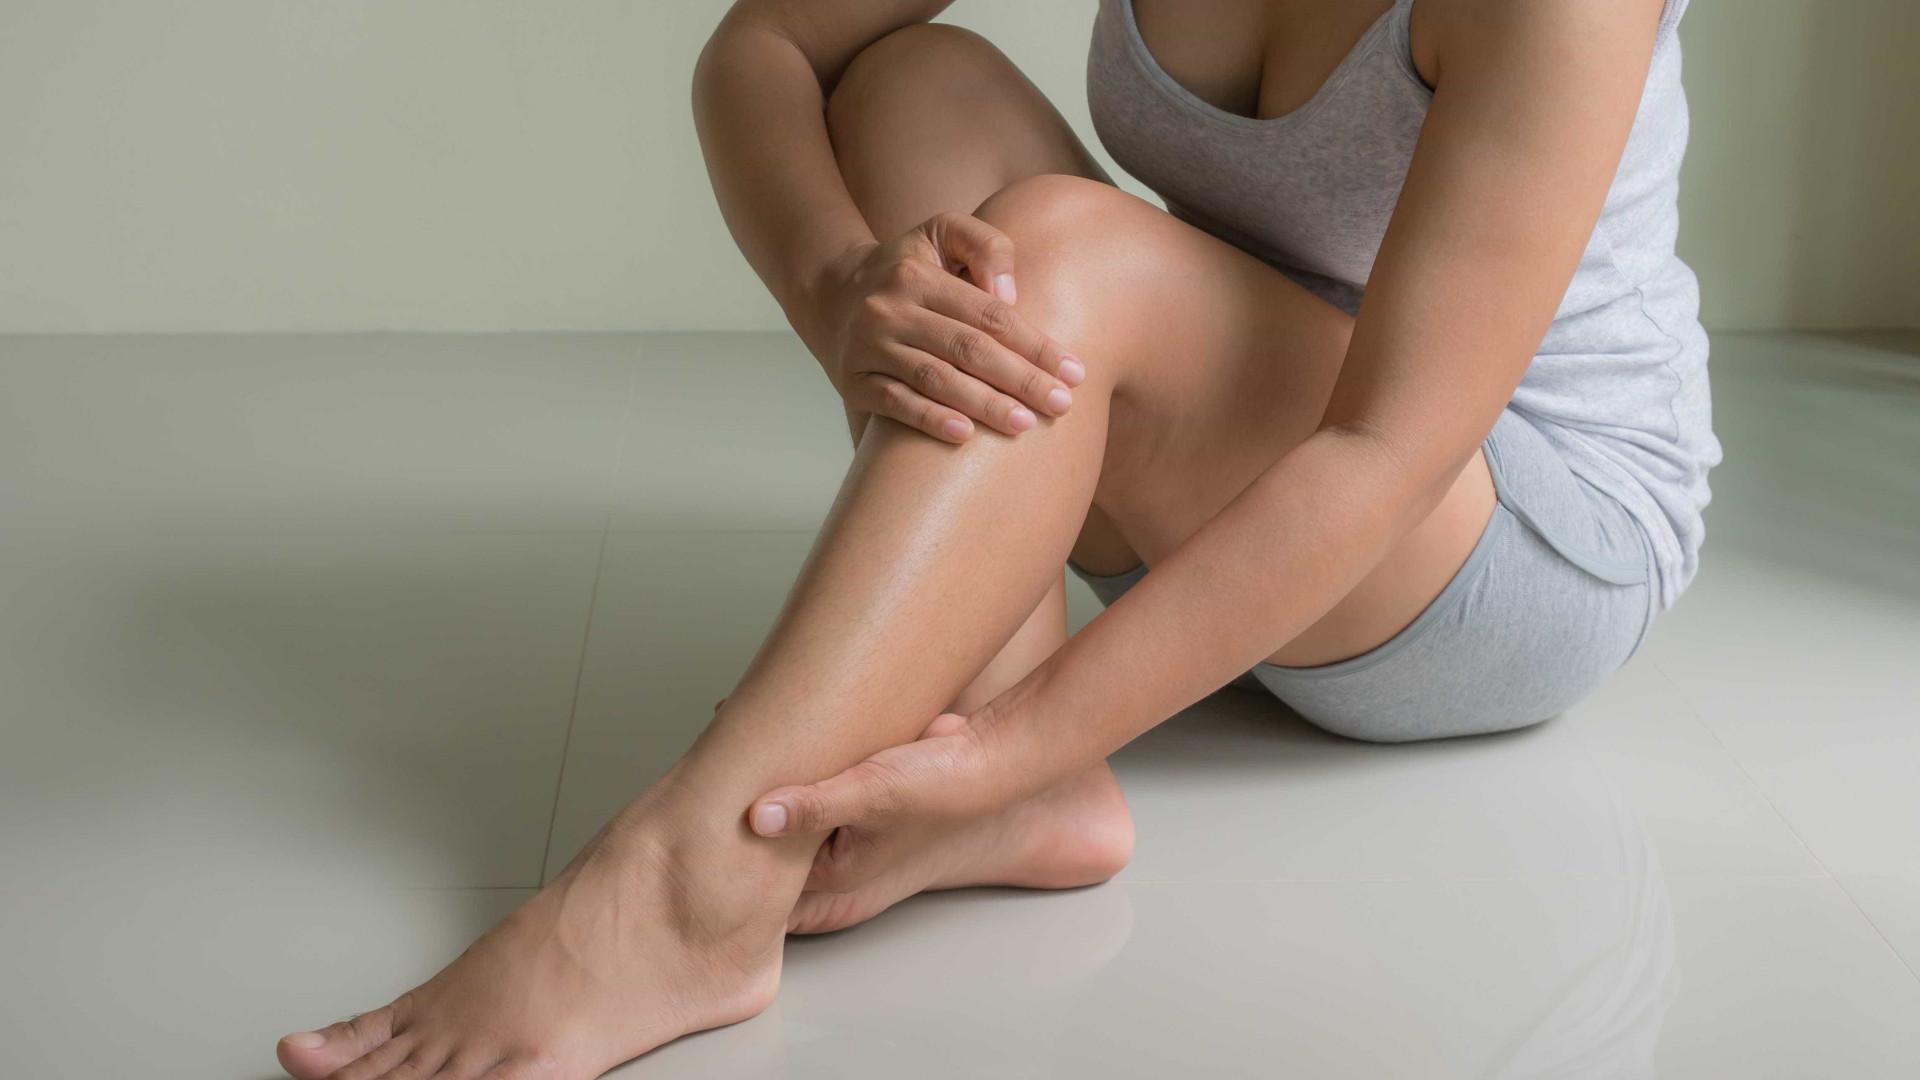 Como identificar e combater os problemas de dores nas pernas?